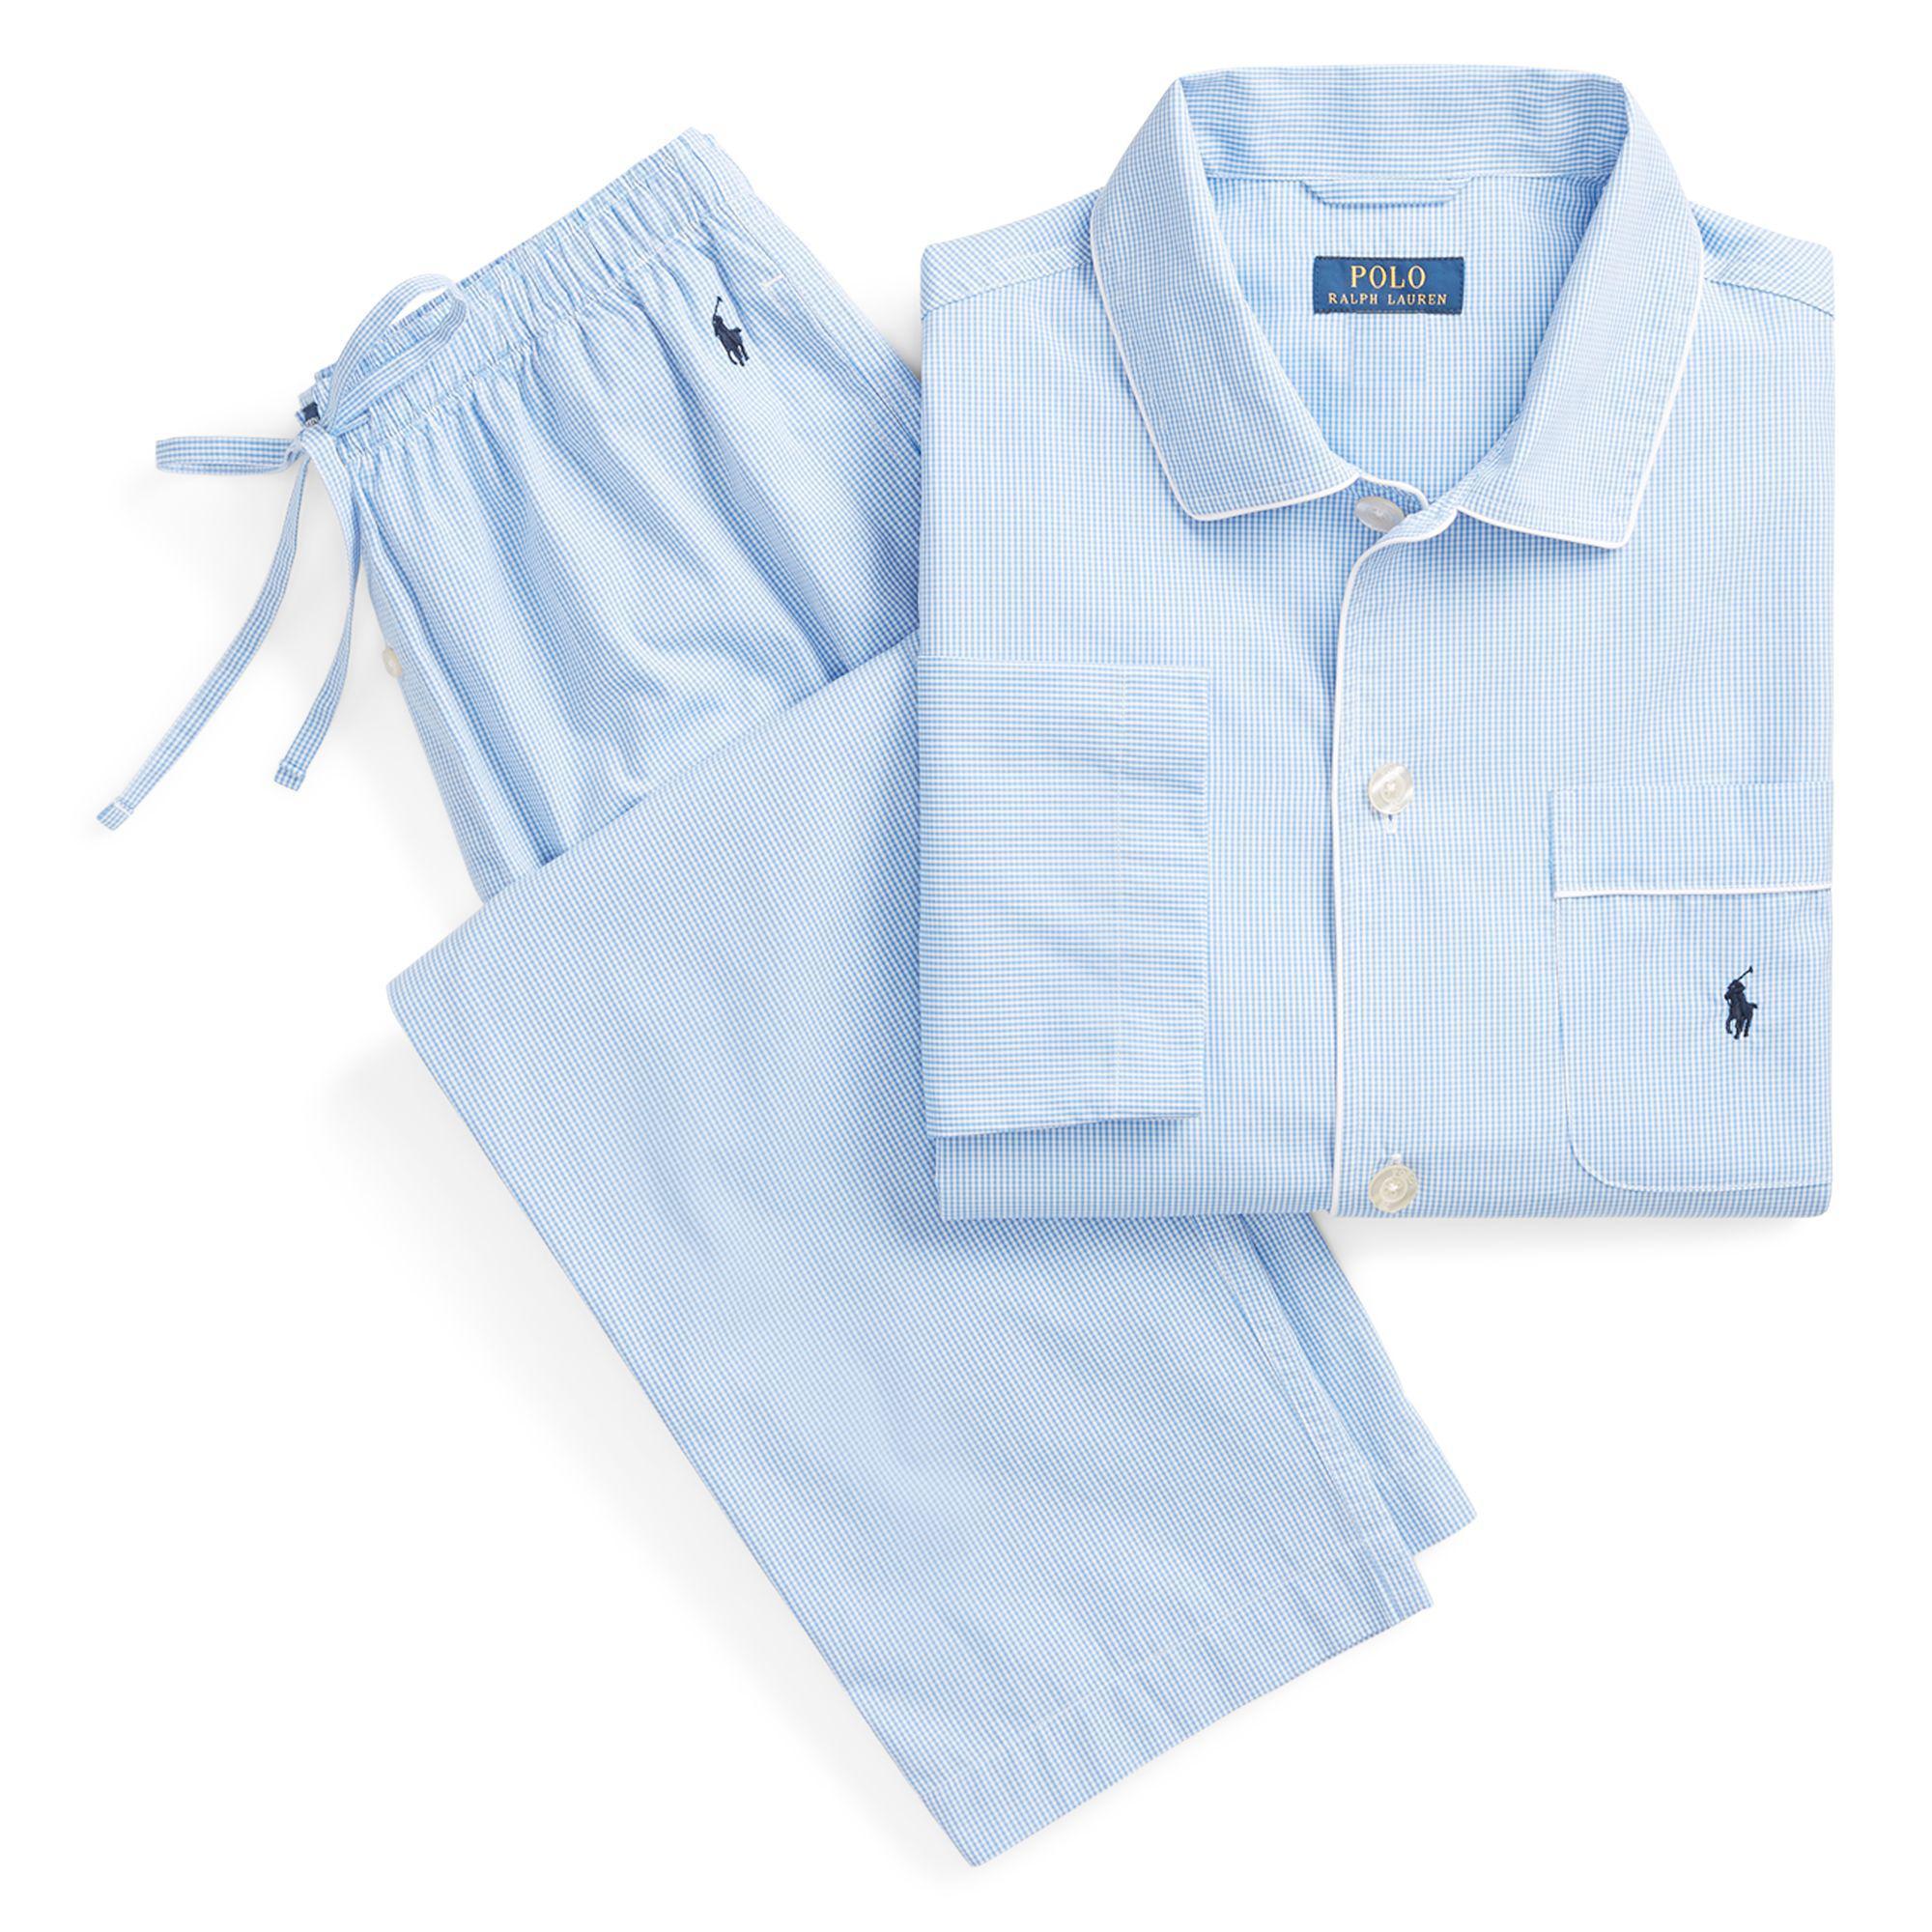 Polo Ralph Lauren Gingham Poplin Long Sleep Set in Blue for Men - Lyst 90cff9b11831